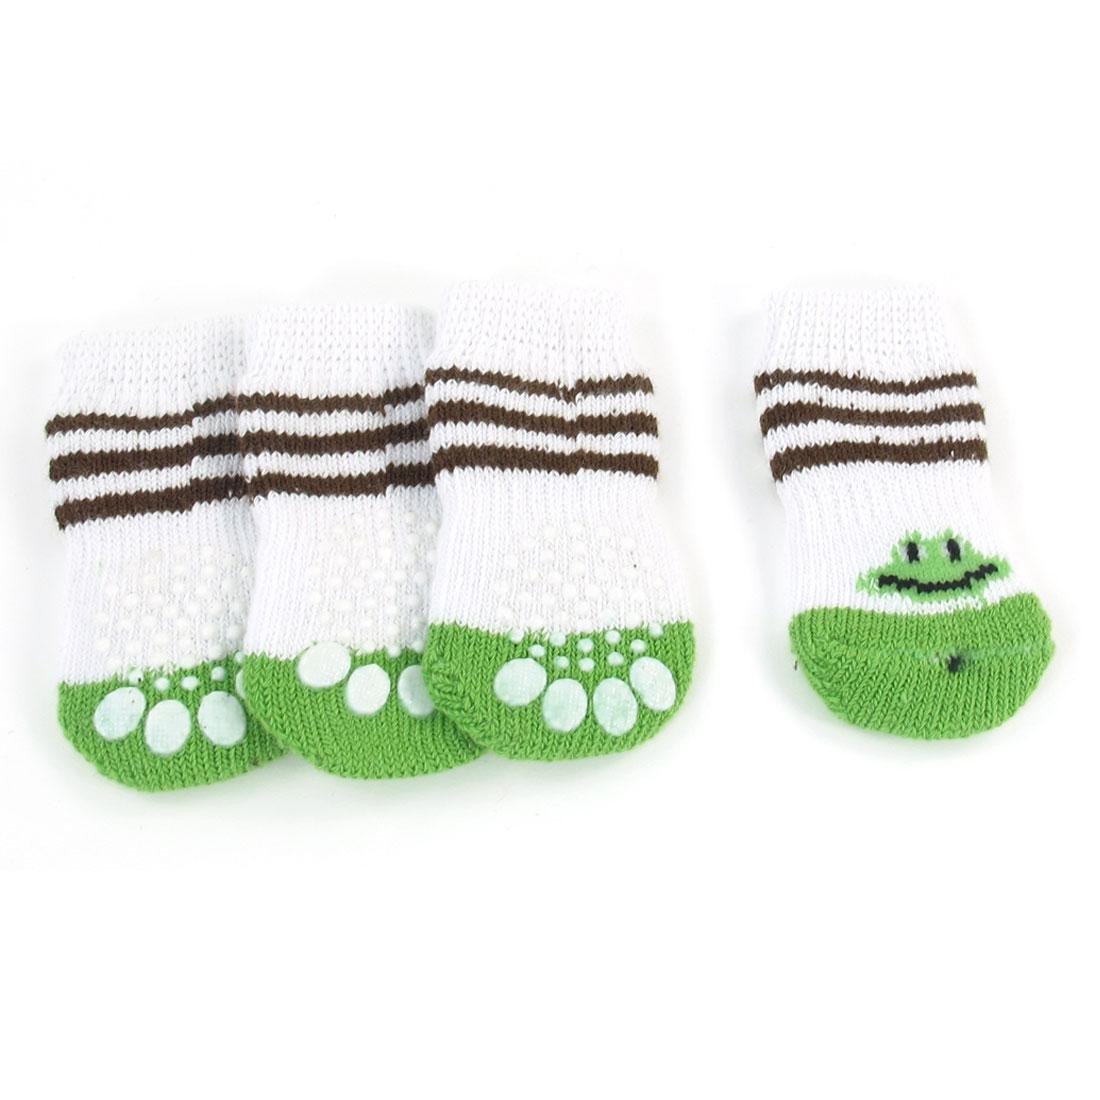 2 Pairs White Paw Pattern Nonskid Elastic Pet Dog Yorkie Puppy Socks Size S